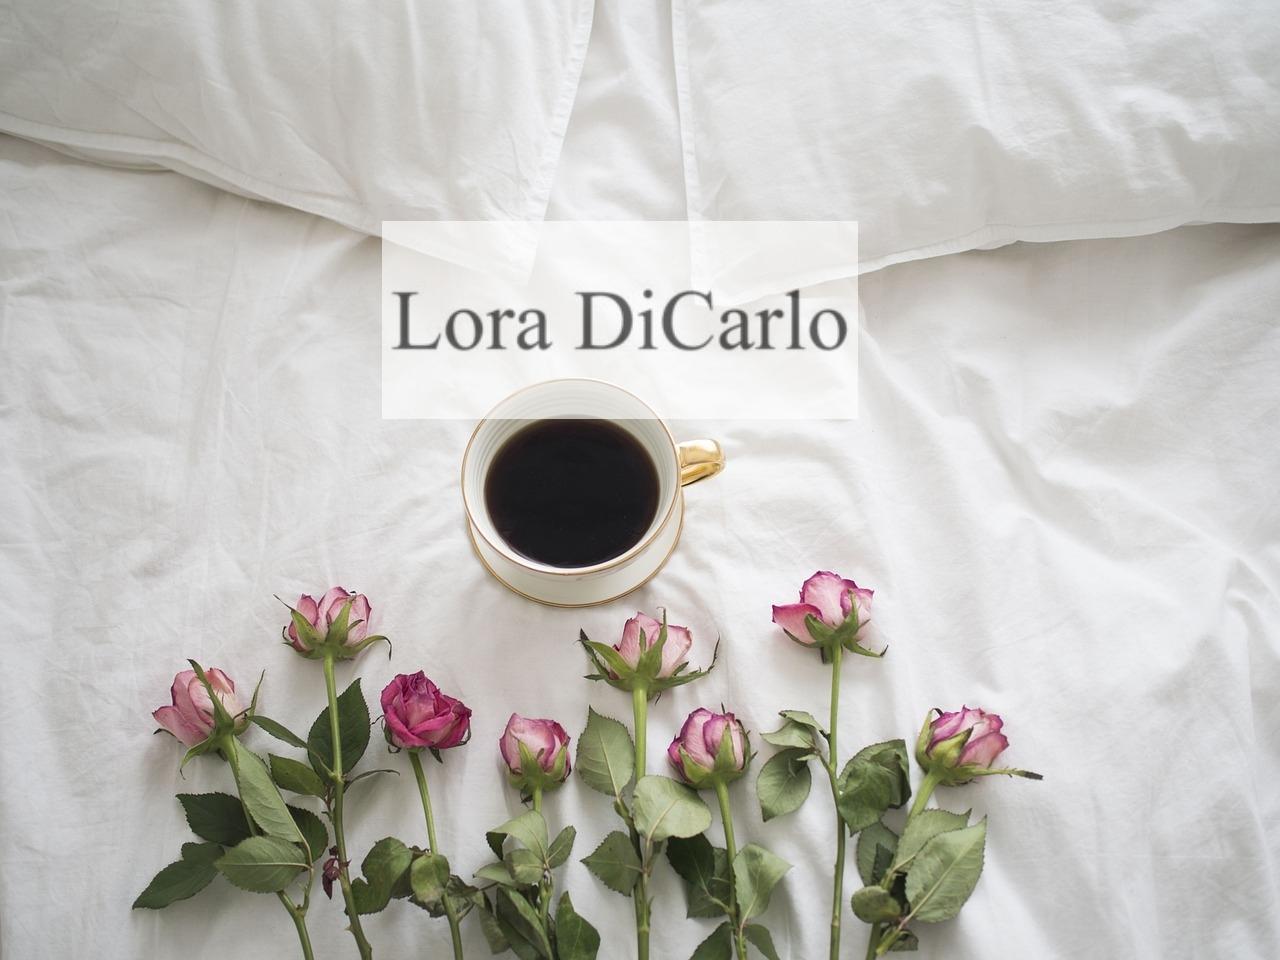 Oregon Startup Lora DiCarlo Raises $1 1 Million For